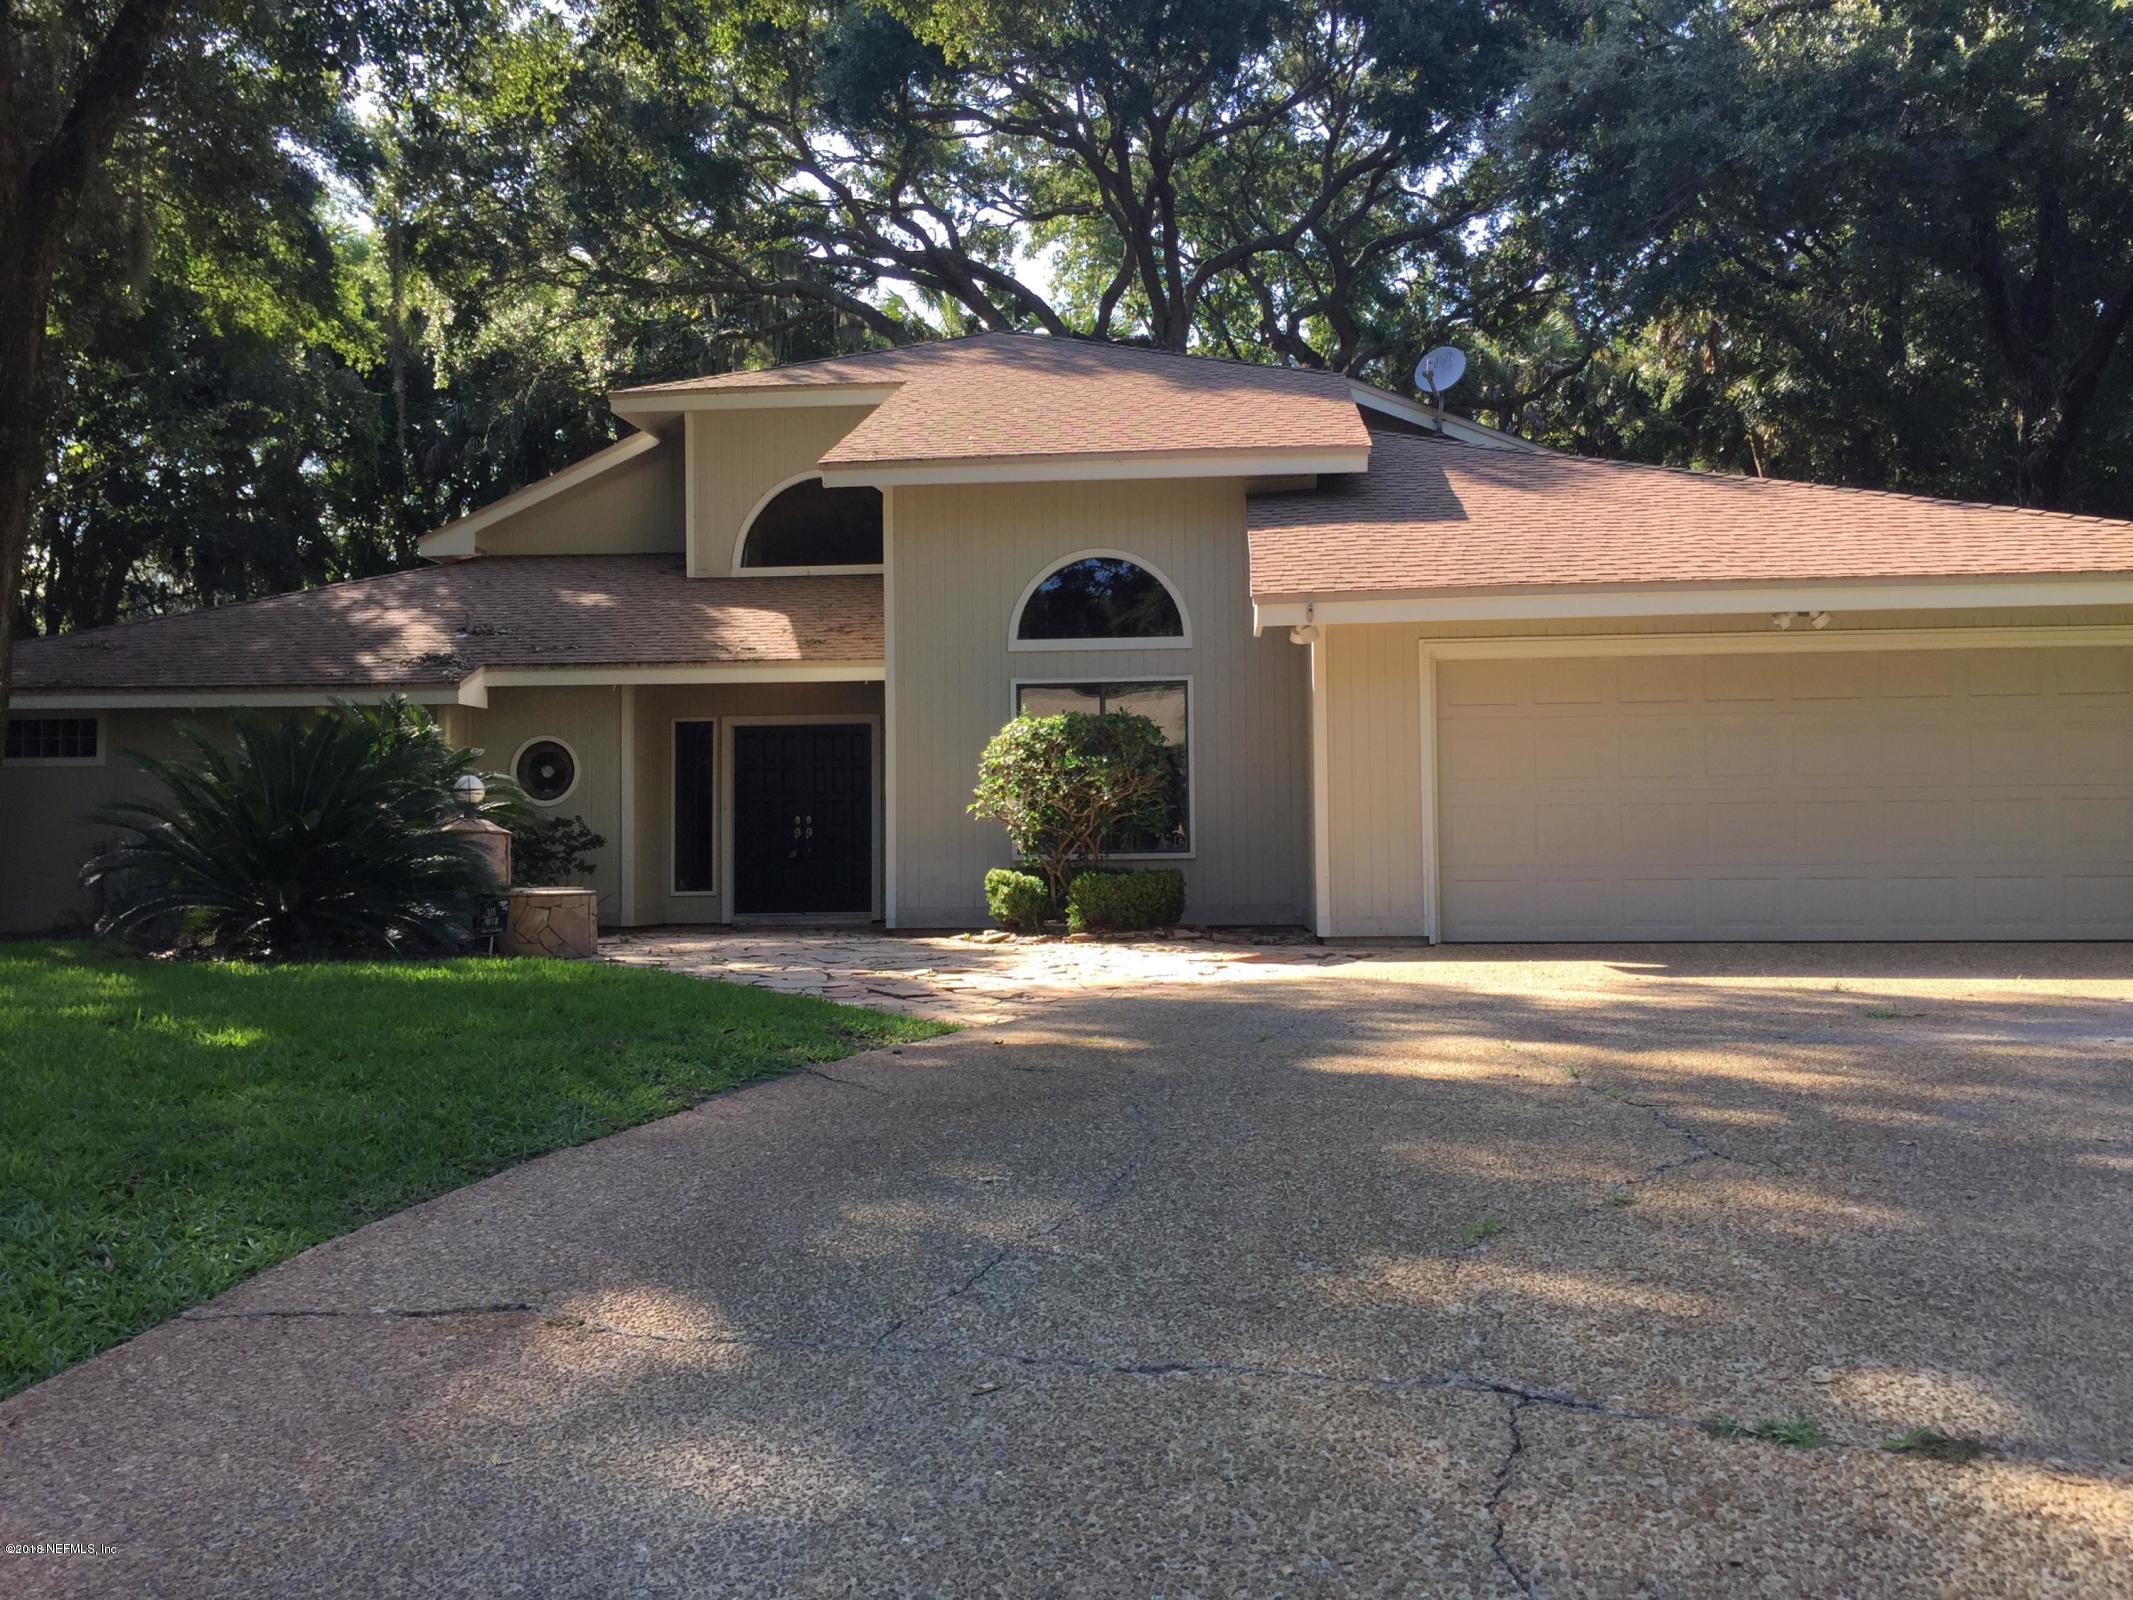 2026 DUNA VISTA, ATLANTIC BEACH, FLORIDA 32233, 3 Bedrooms Bedrooms, ,2 BathroomsBathrooms,Residential - single family,For sale,DUNA VISTA,965662